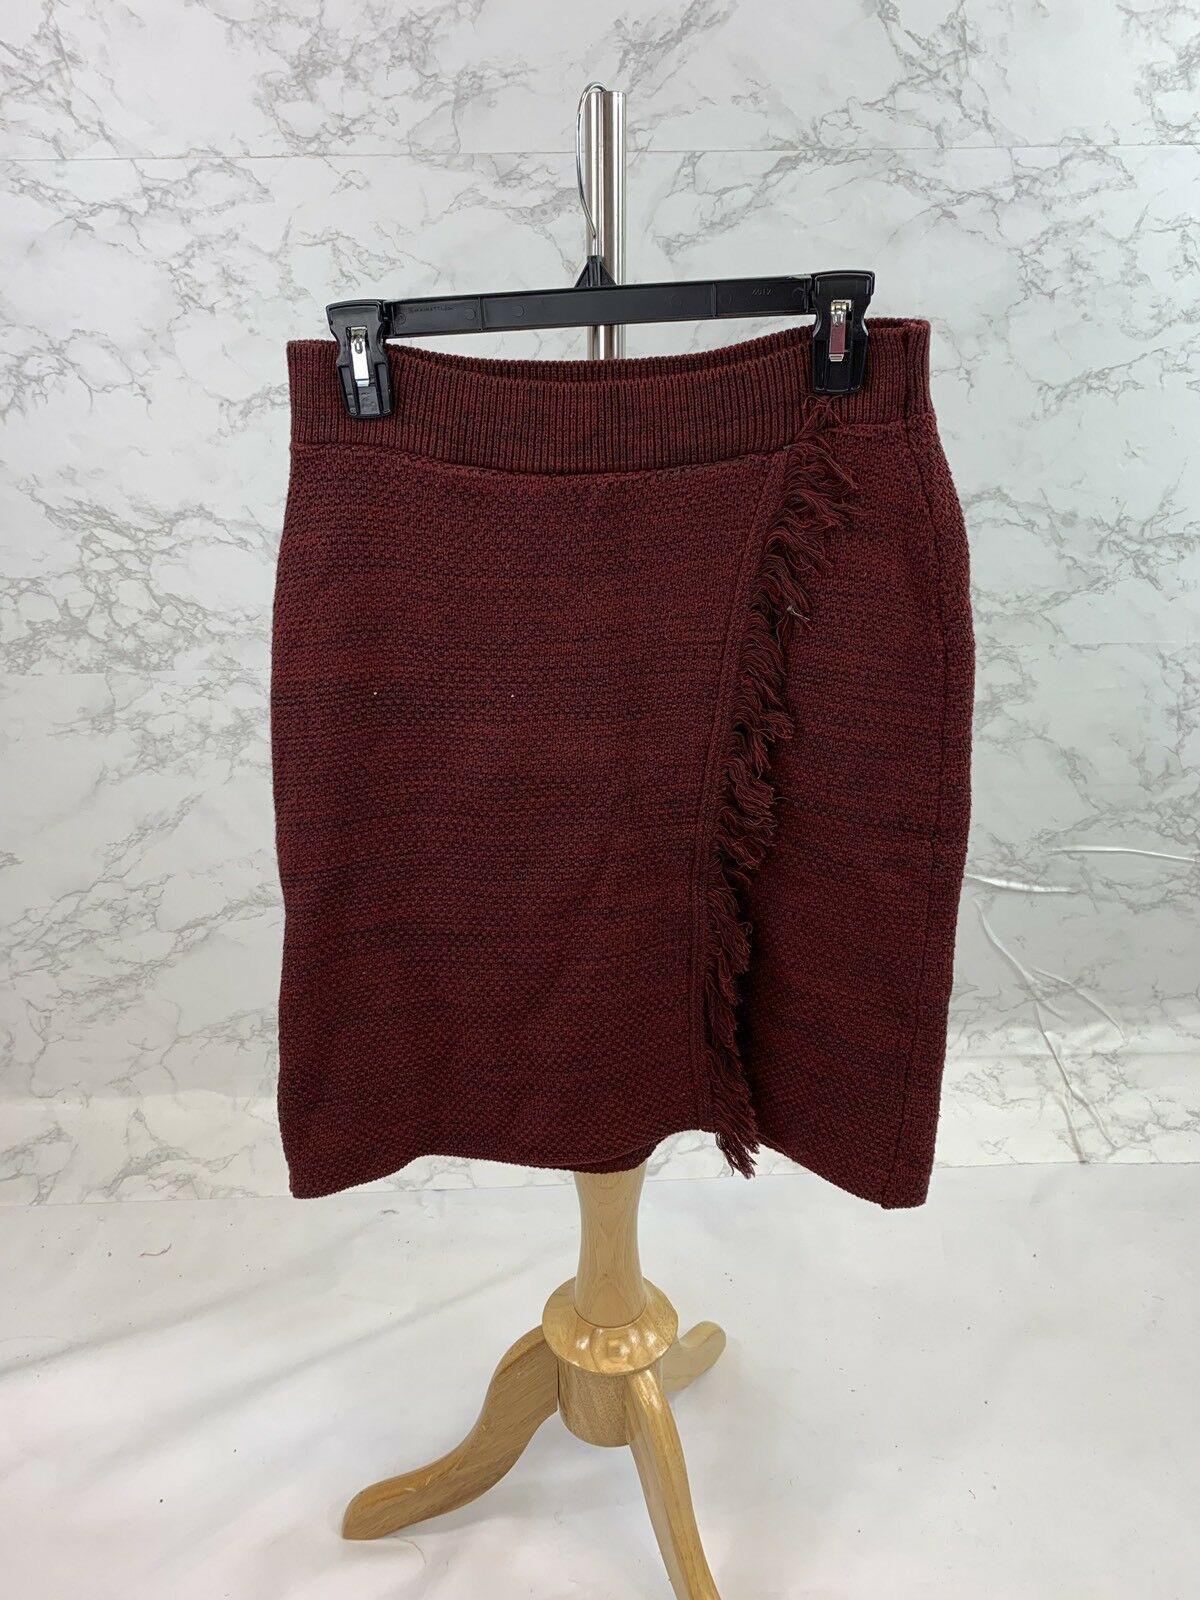 Anthropologie Maeve Womens Maroon Knitted Skirt Sz Medium